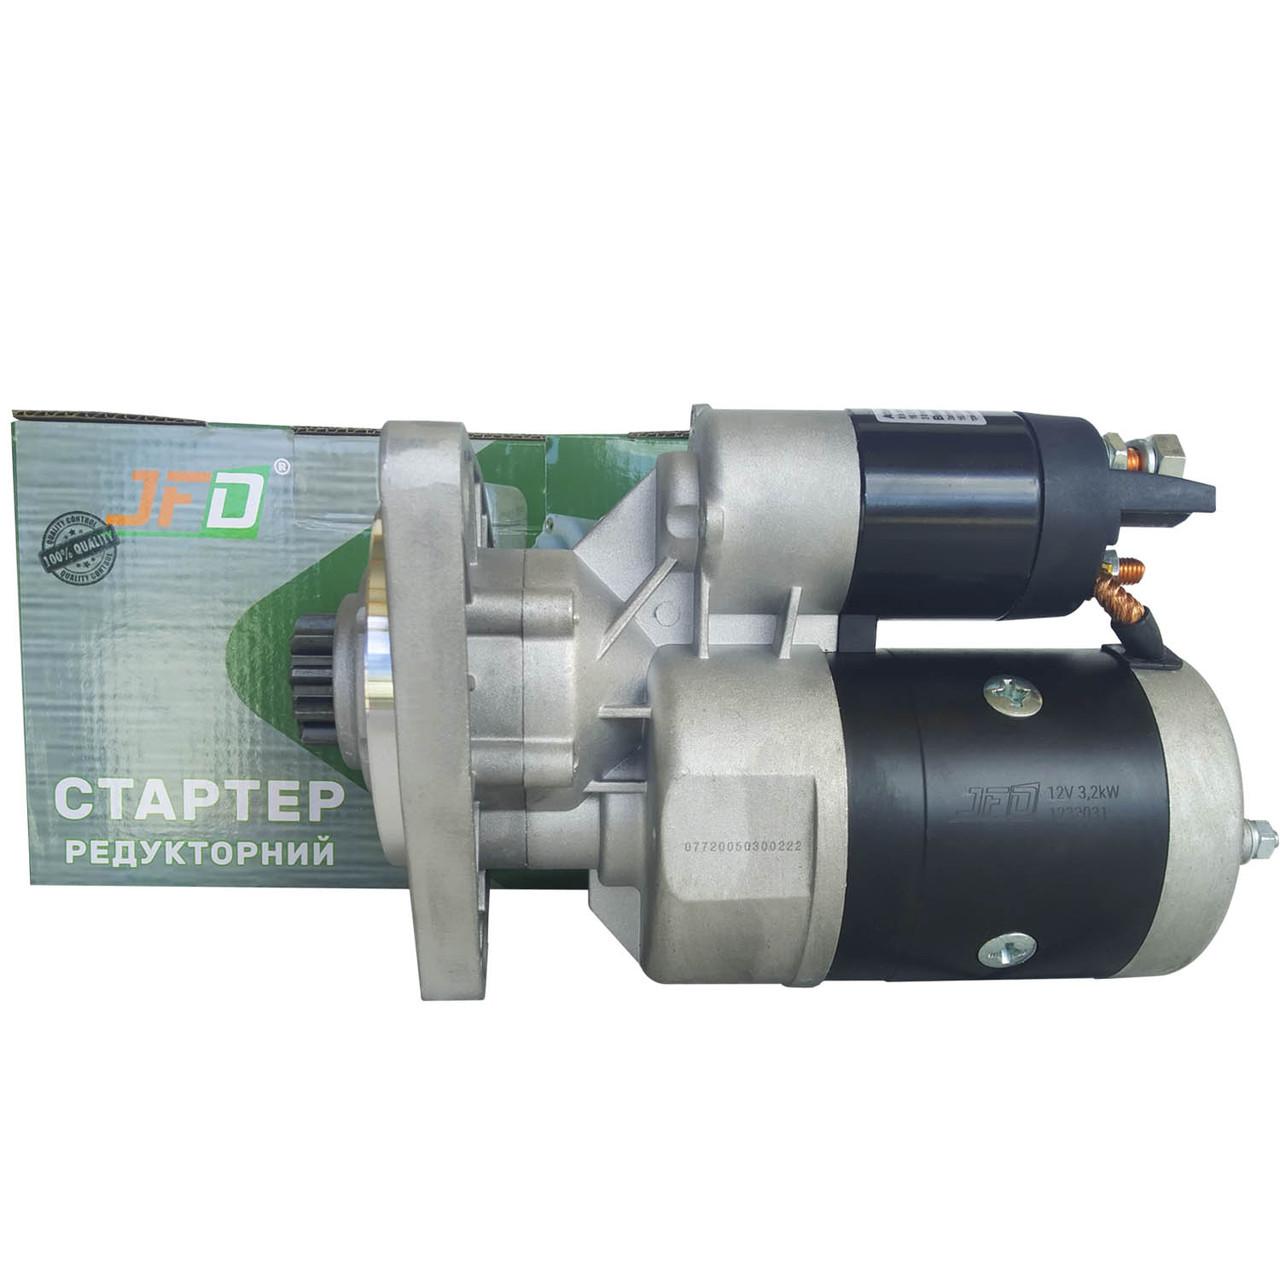 Стартер редукторний МТЗ Т40 Т25 JFD 12В 3,2 кВт арт. 1232031 (аналог Jubana 123708031)